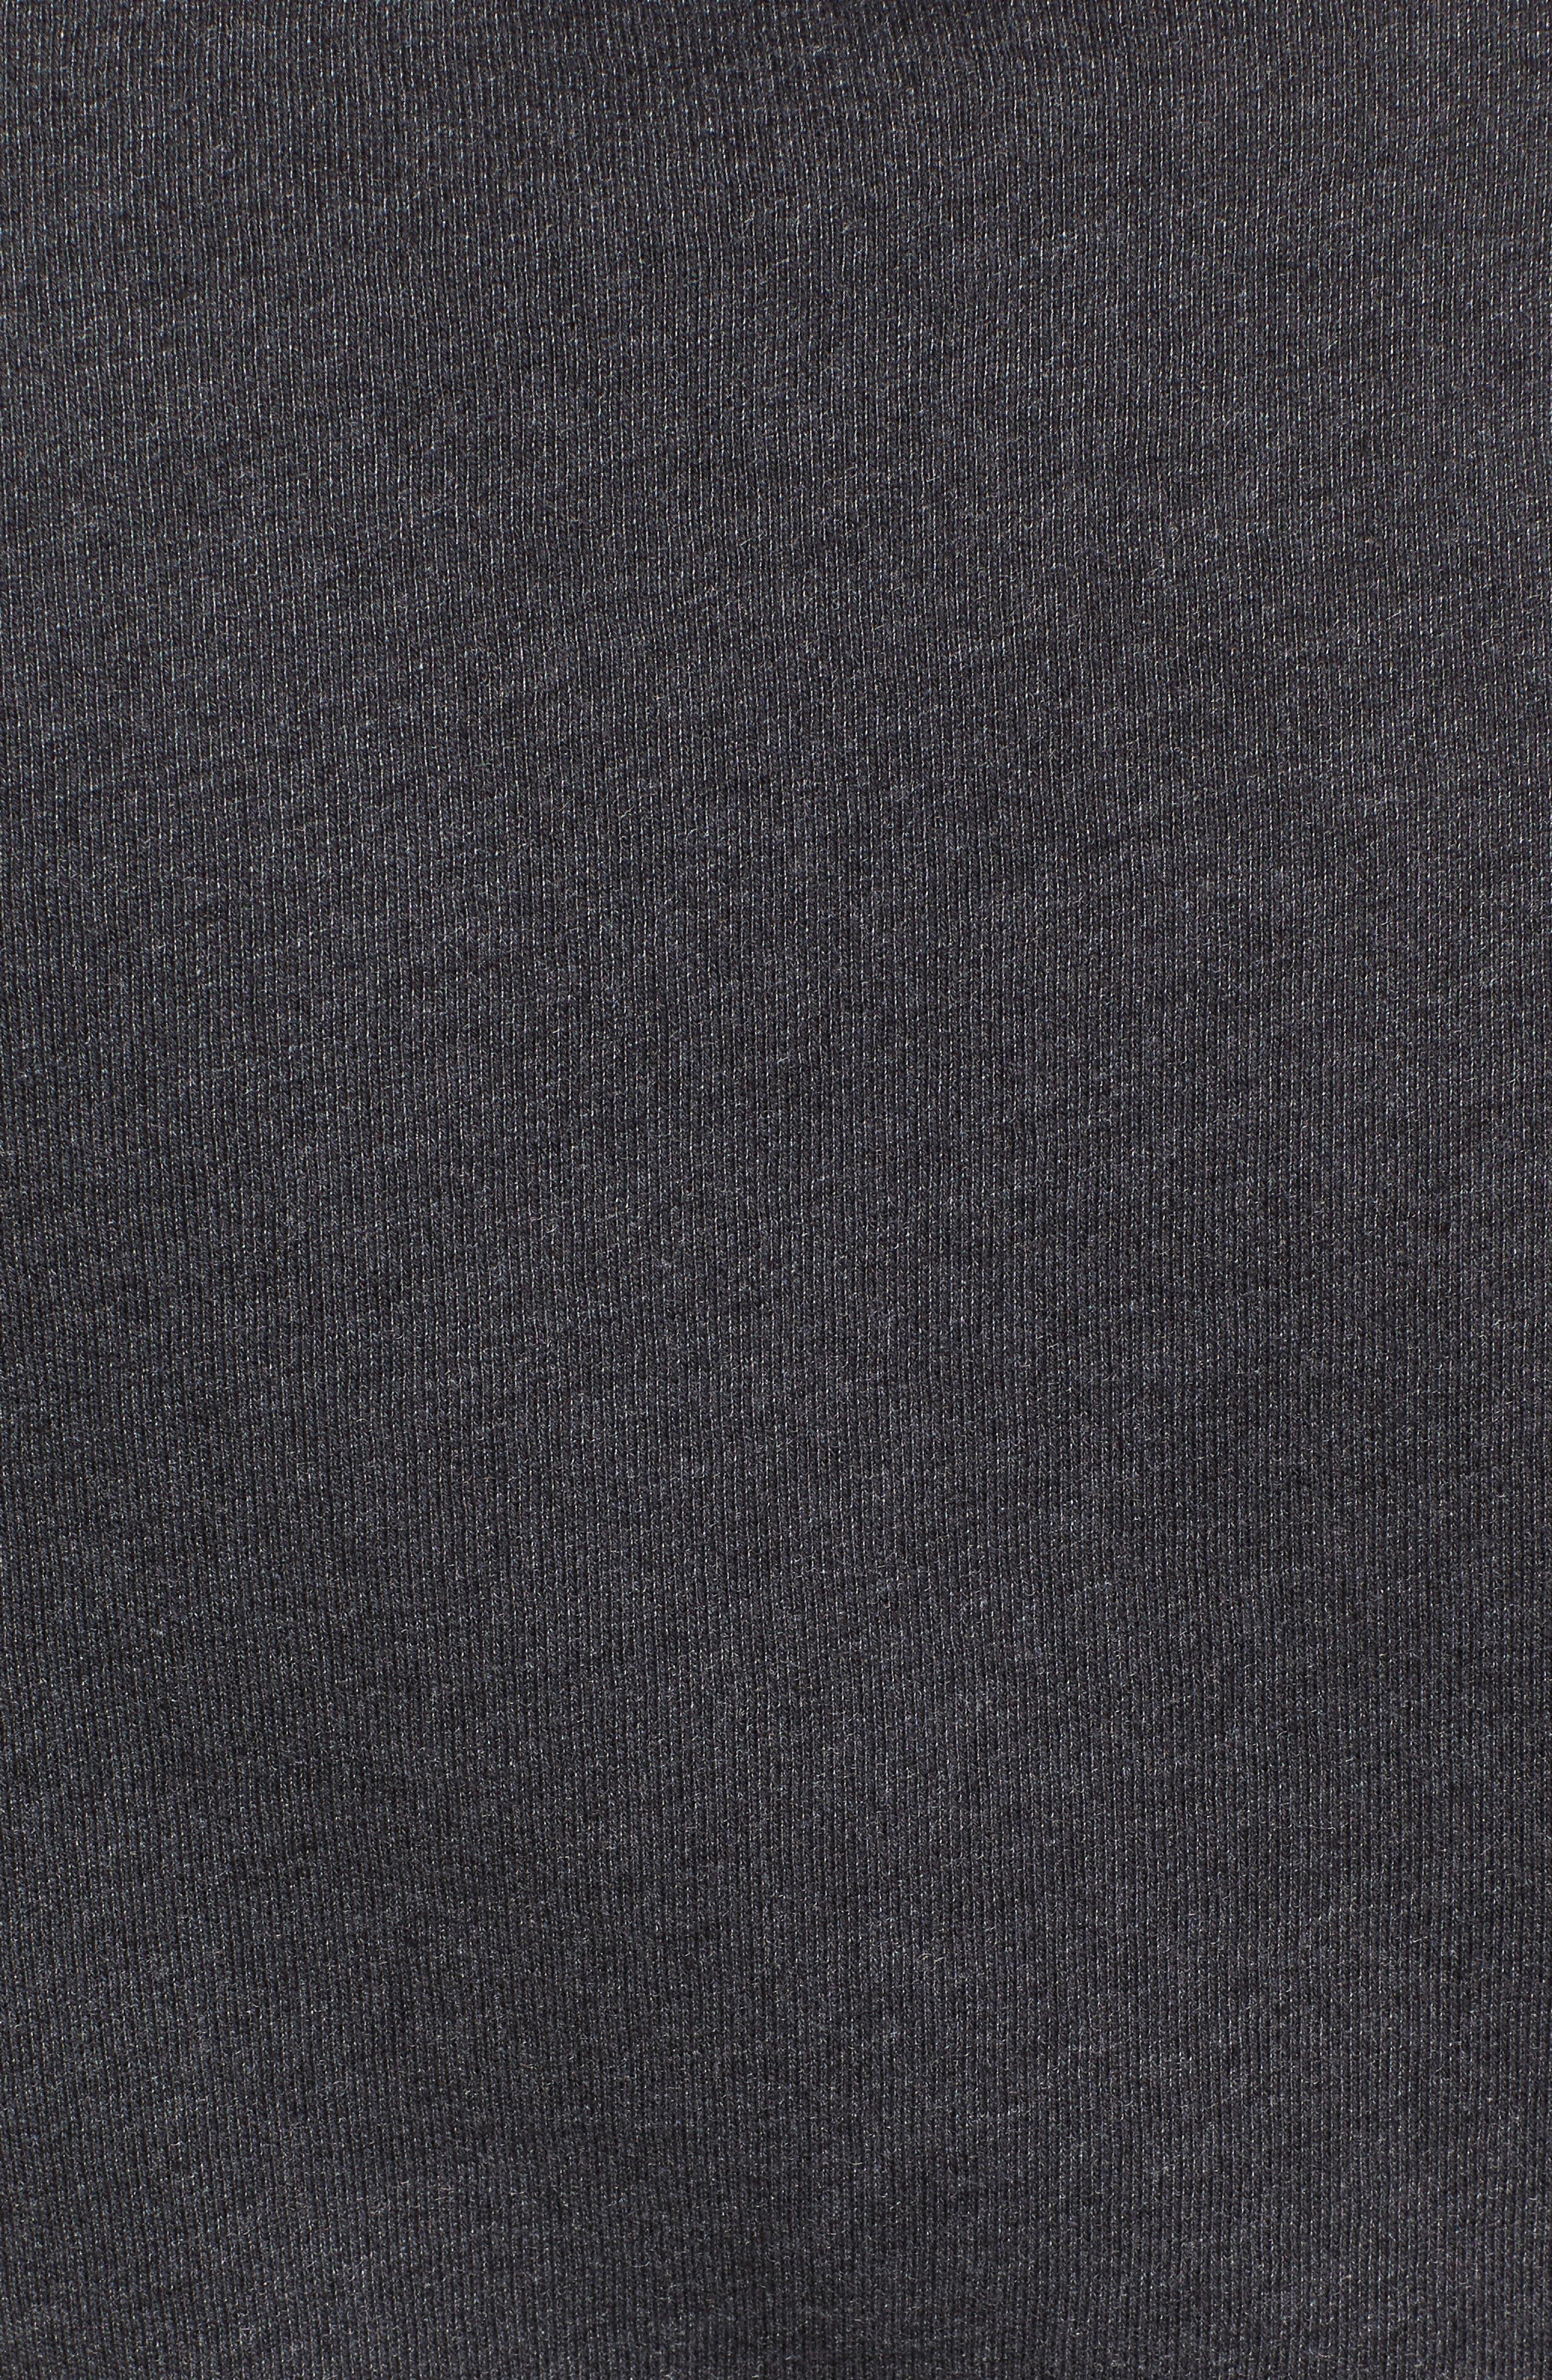 Bonjour Sweatshirt,                             Alternate thumbnail 5, color,                             Faded Black